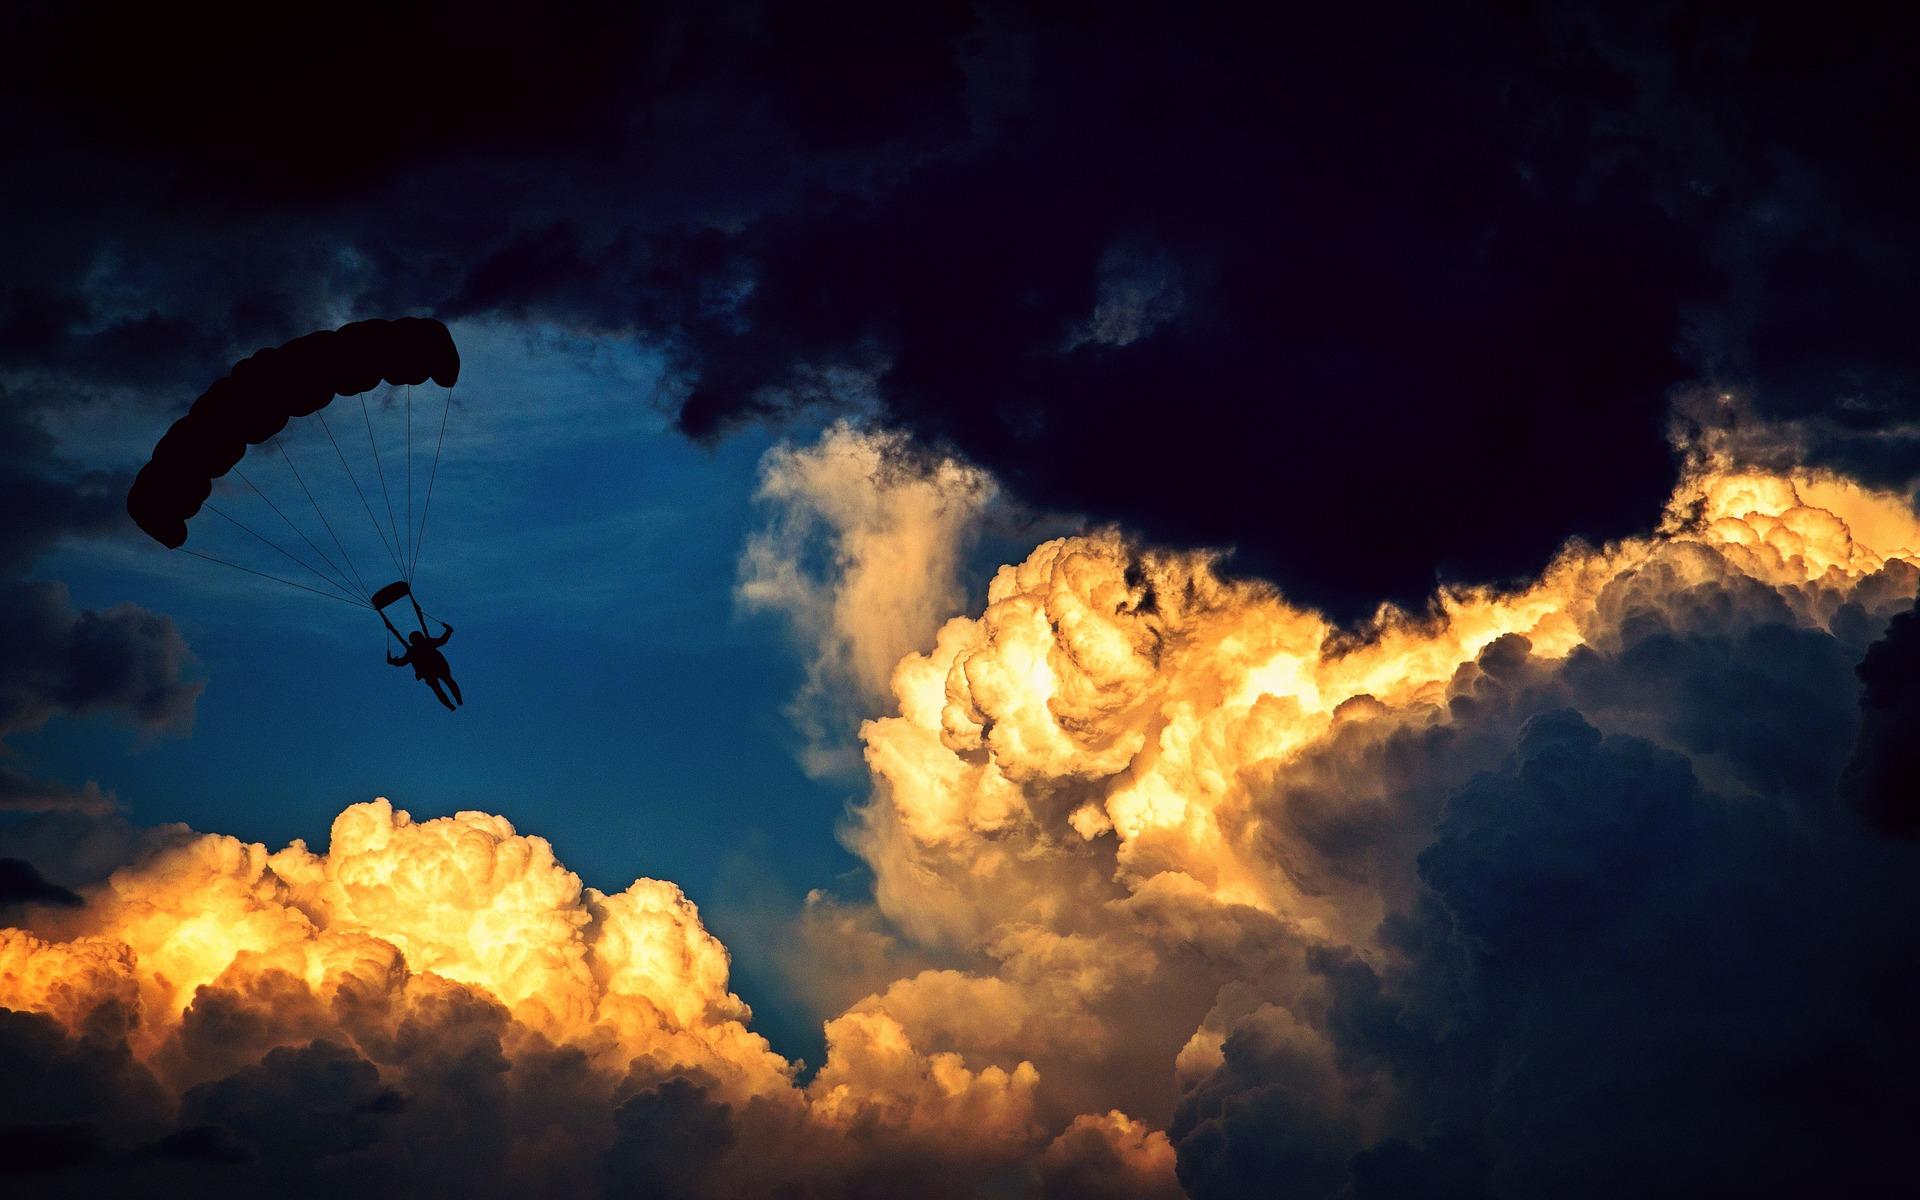 parachute-1843350_1920